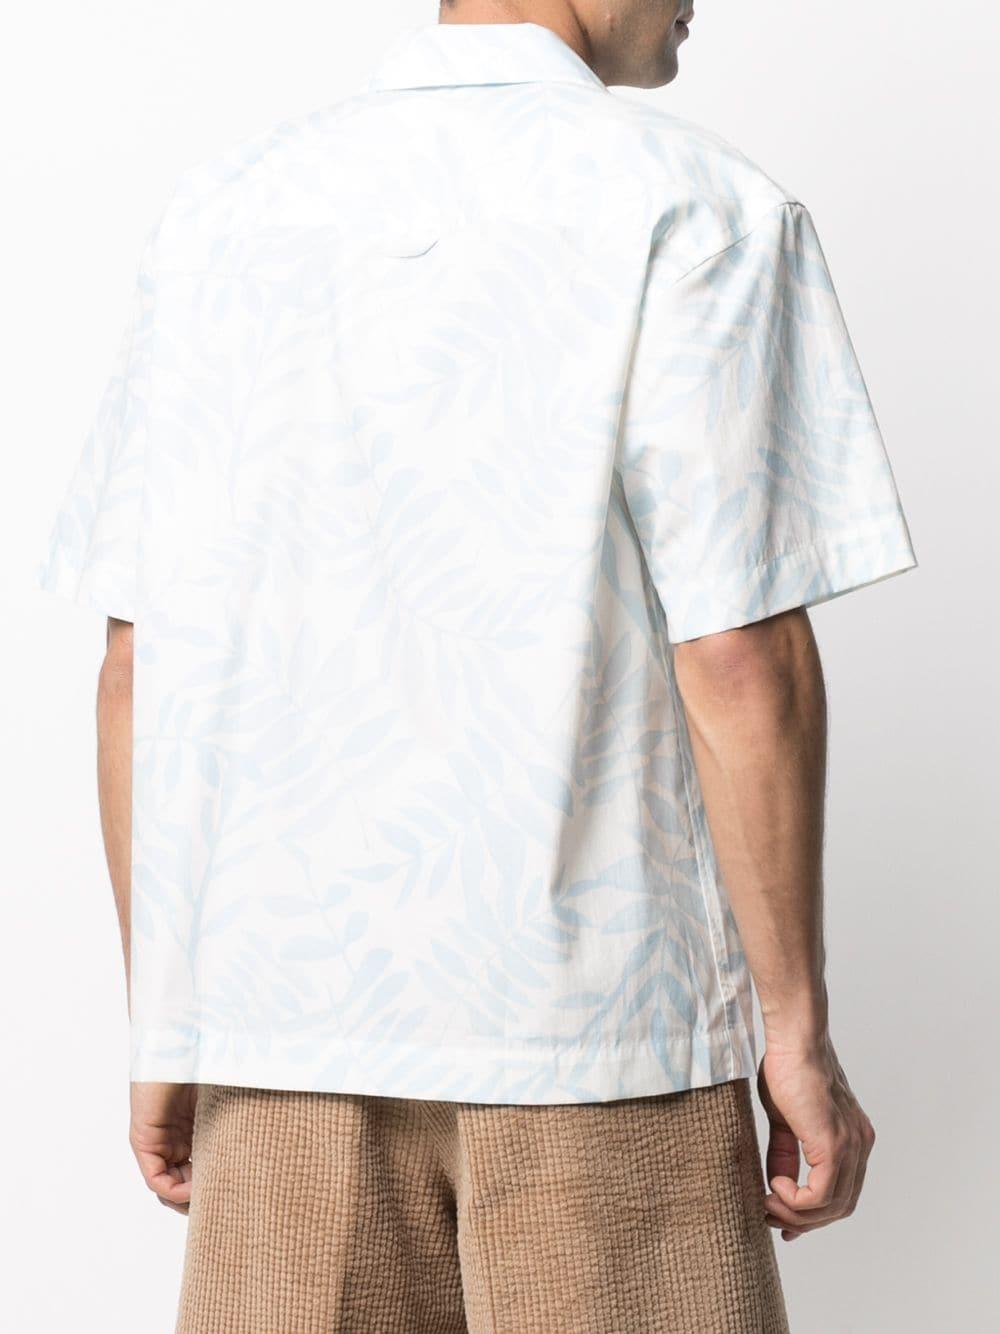 PRINT SHIRT JACQUEMUS | Shirts | 215SH21PRINT BLUE LEAVES